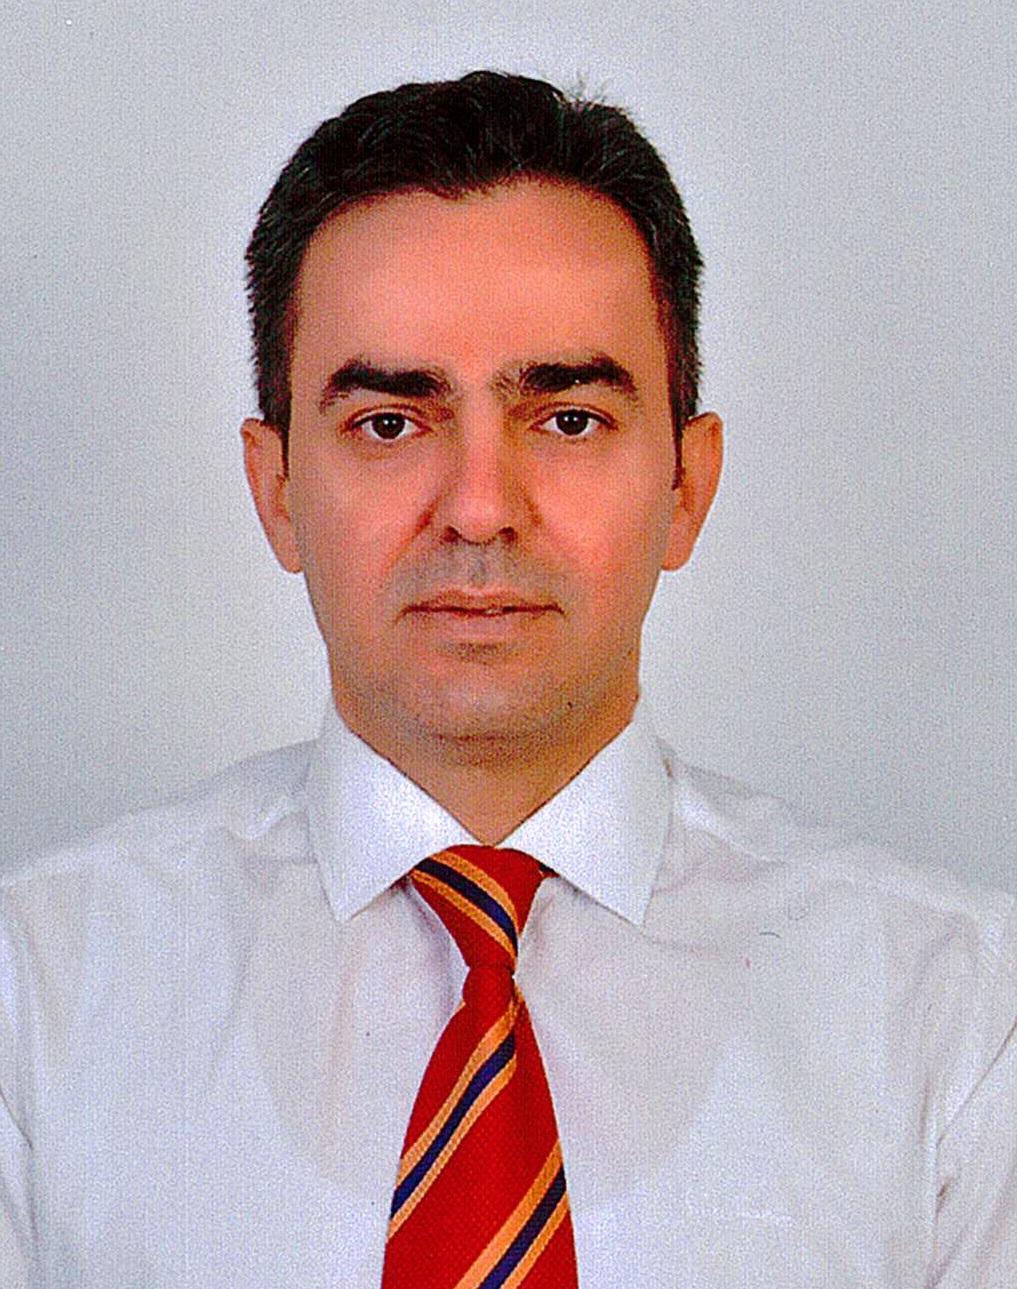 Prof. Dr. TURAN ERDOĞAN